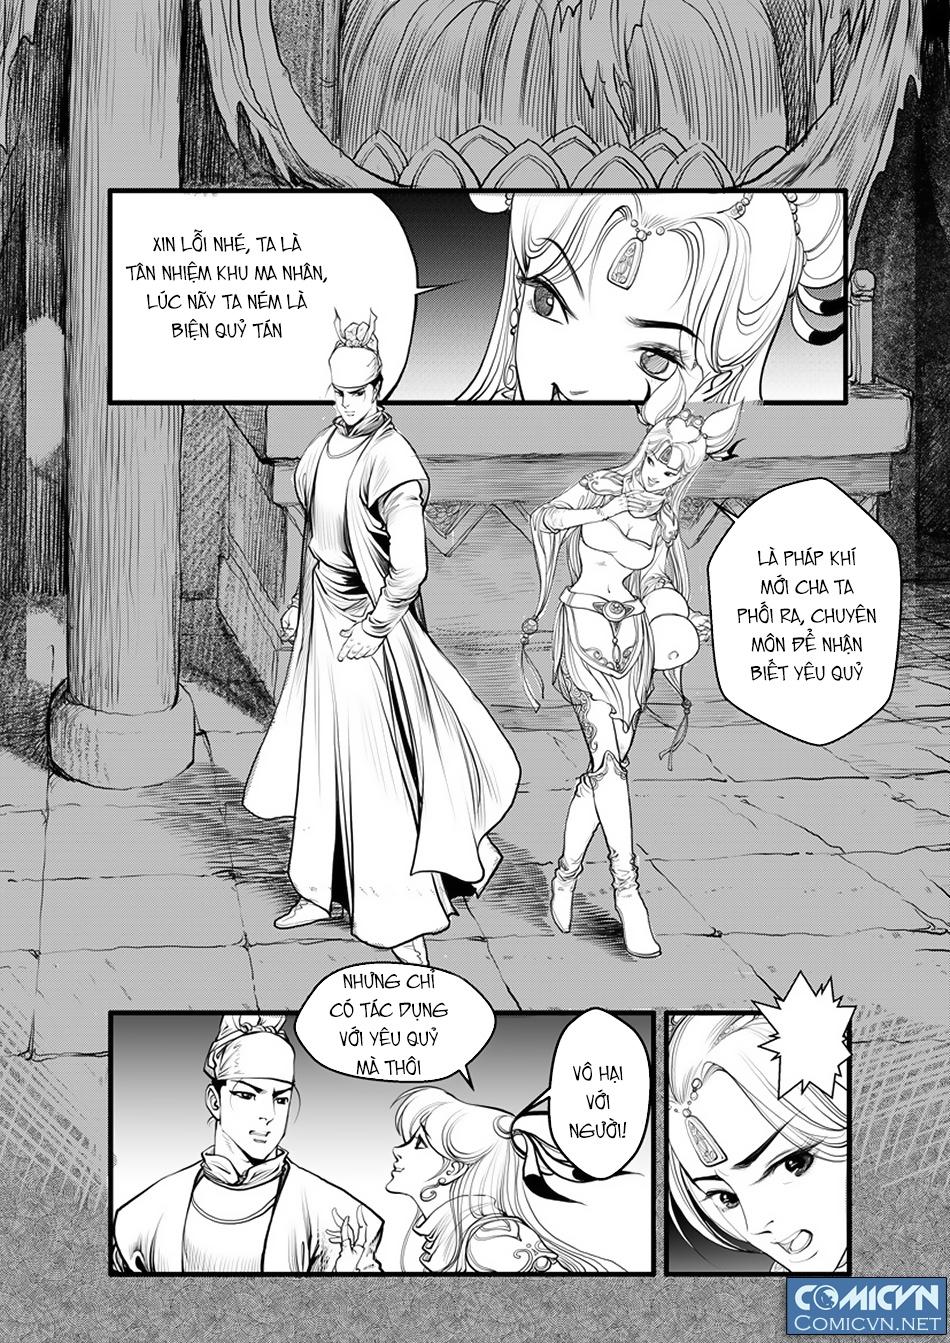 Chung Quỳ Truyền Kỳ Chapter 36 - Hamtruyen.vn